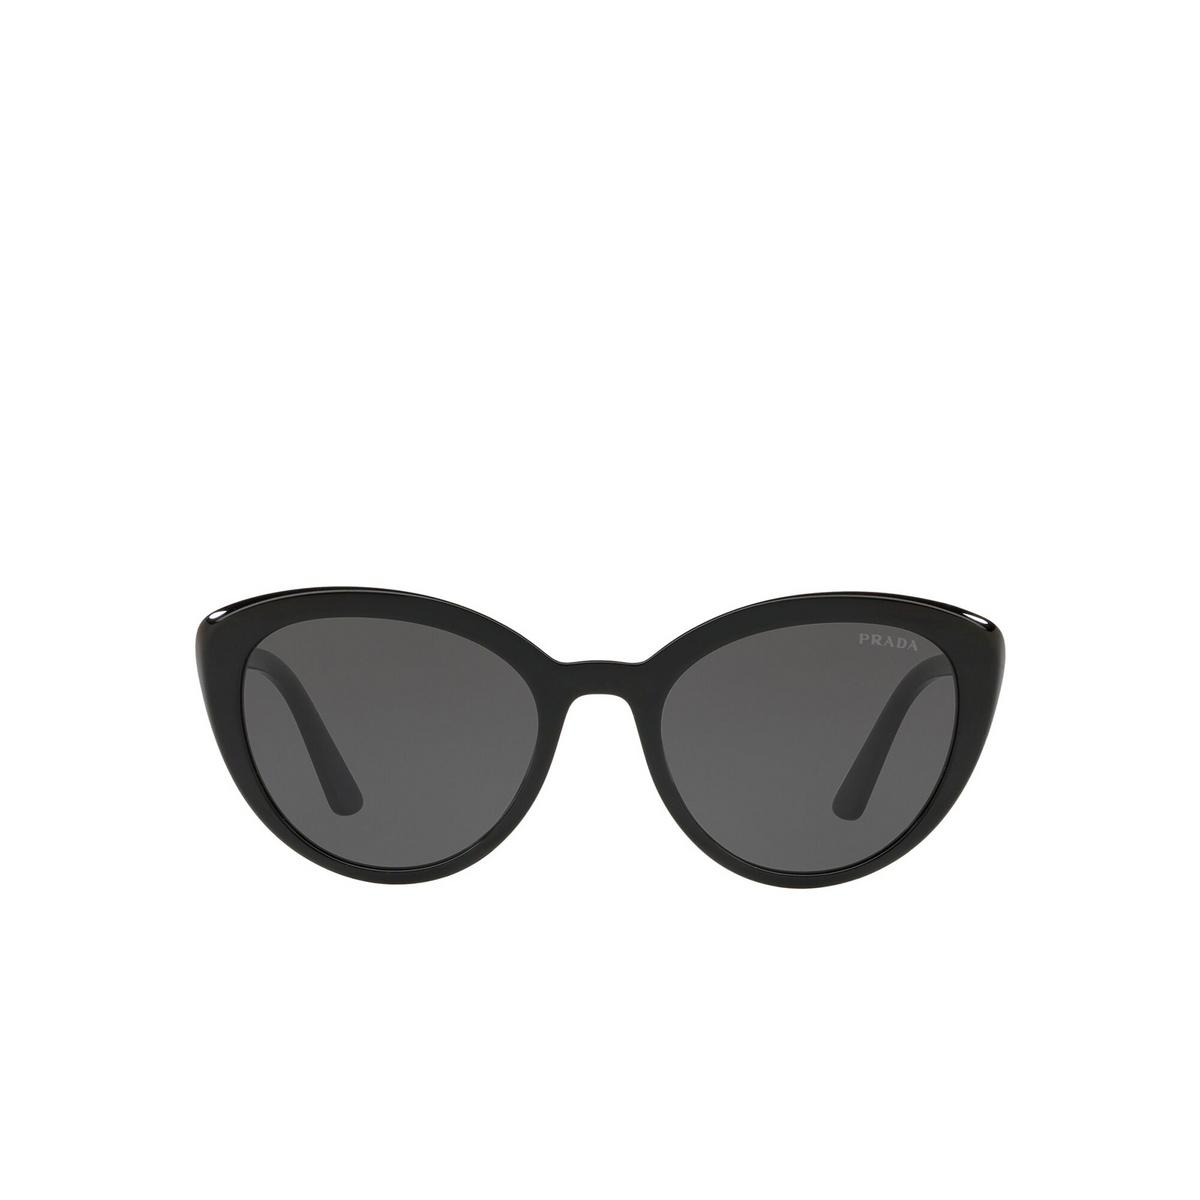 Prada® Cat-eye Sunglasses: Conceptual PR 02VSF color Black 1AB5S0 - front view.